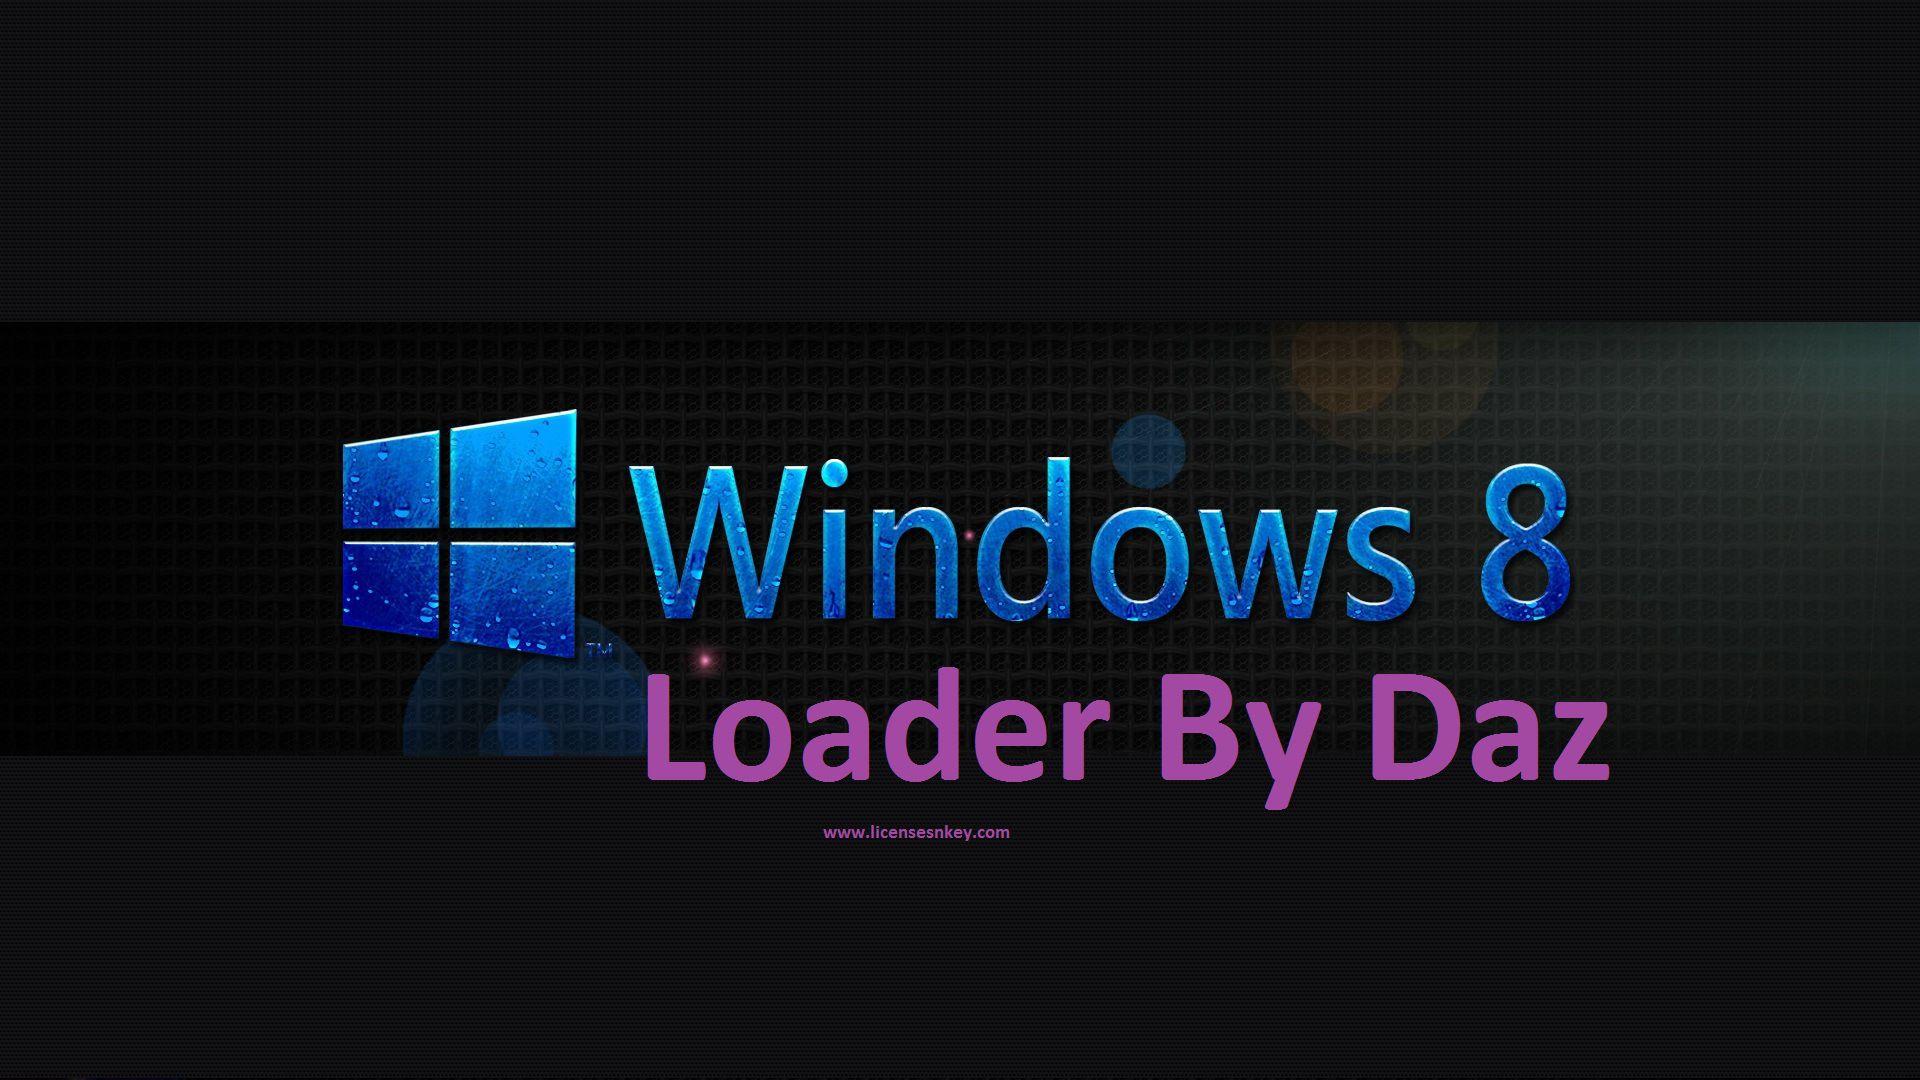 windows 8 loader by daz latest version free download crack windows 8 loader by daz latest version free download